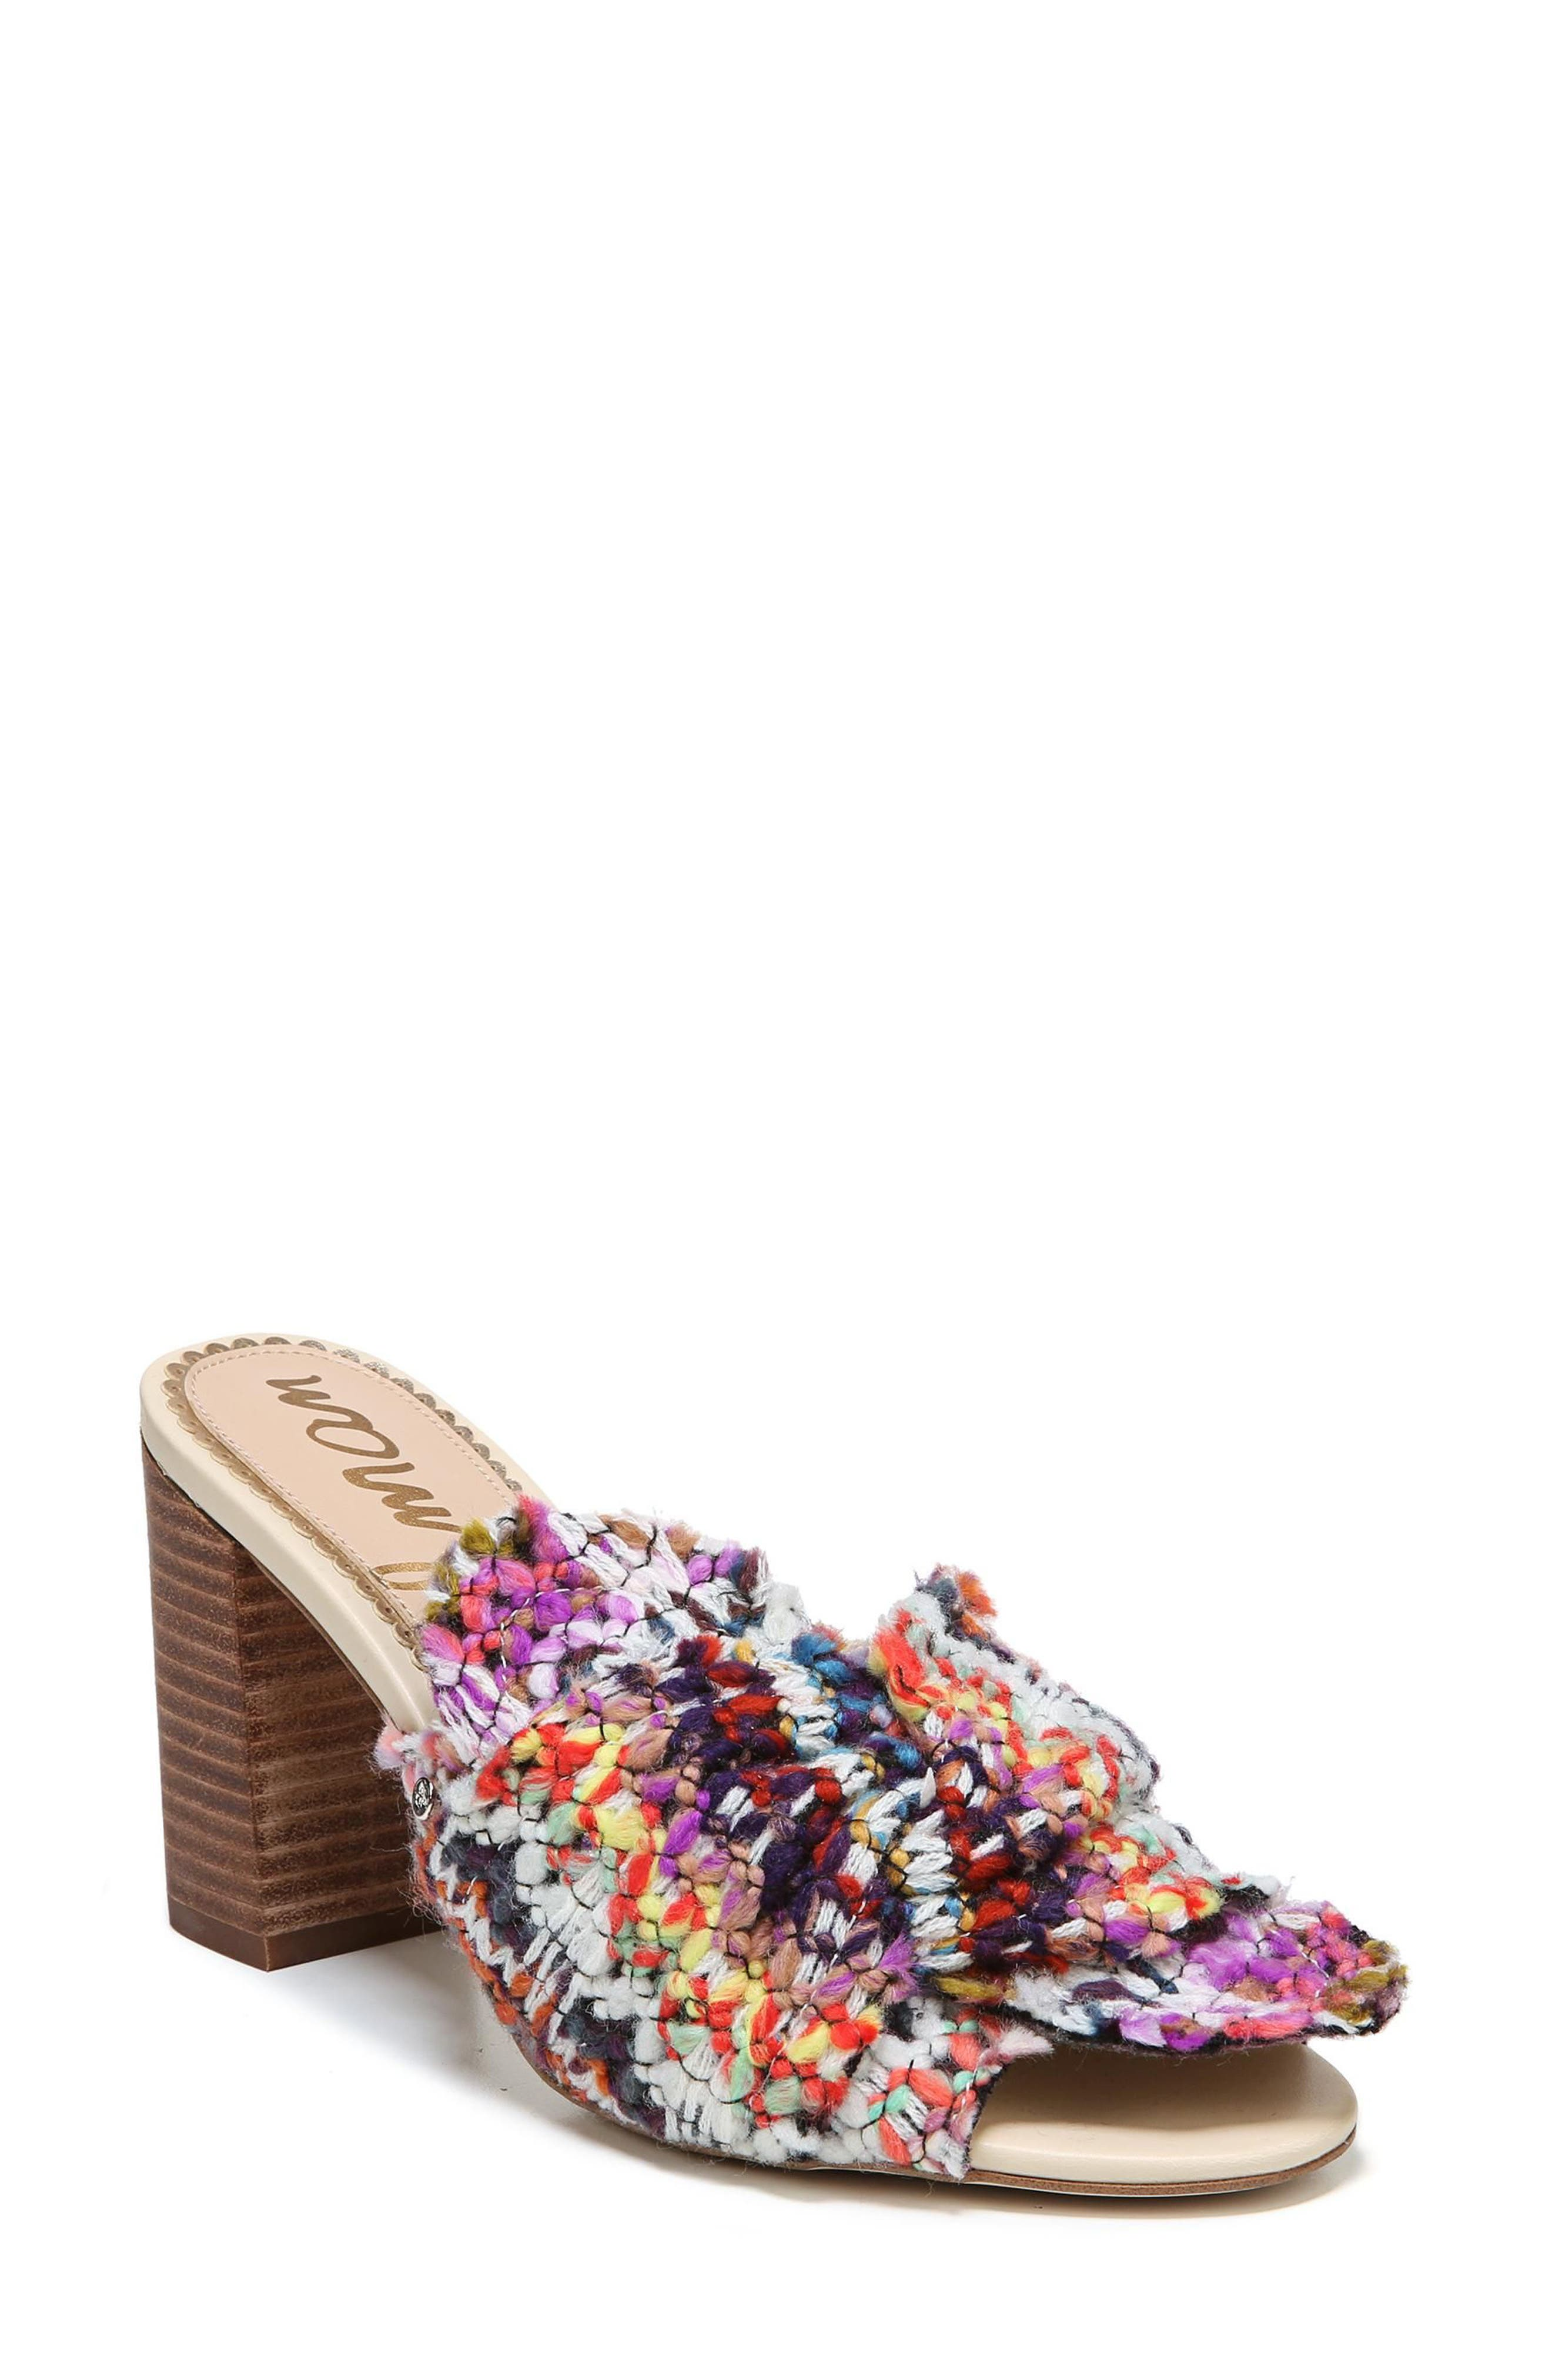 Oda Slide Sandal,                         Main,                         color, 100